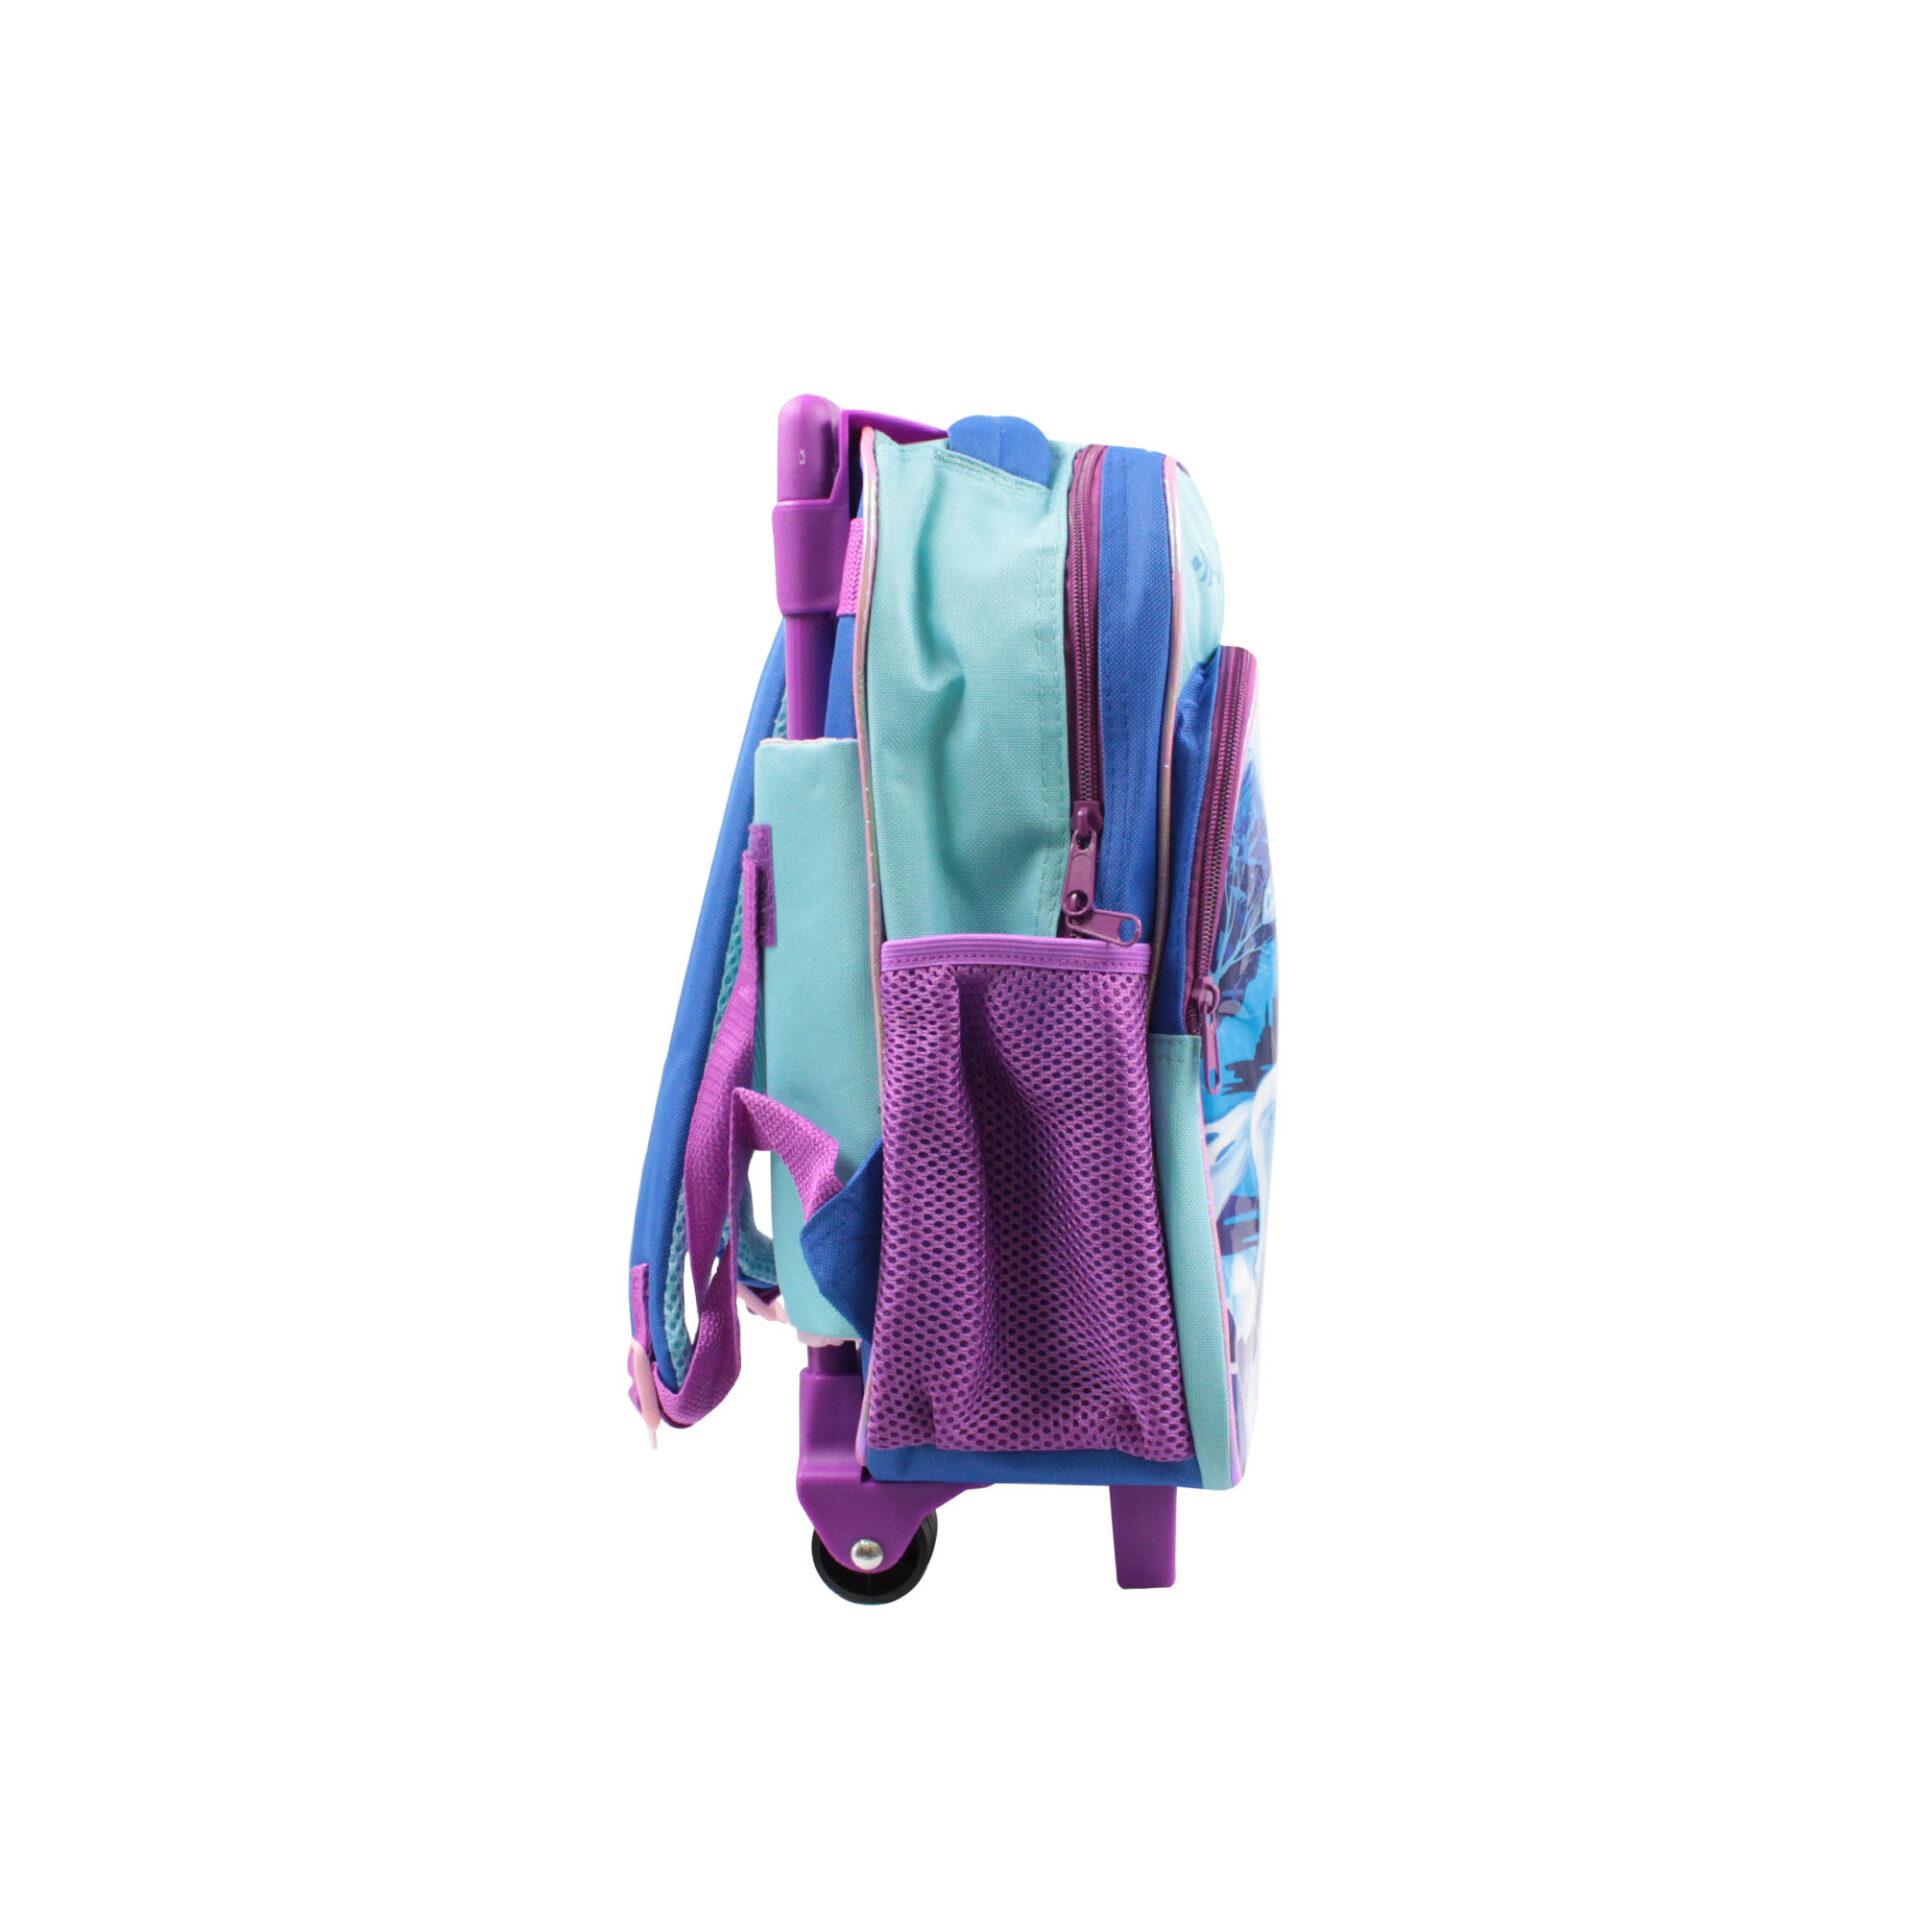 Disney Frozen 2 Princess Elsa With Water Horse Pre School Trolley Bag (Blue & Purple)